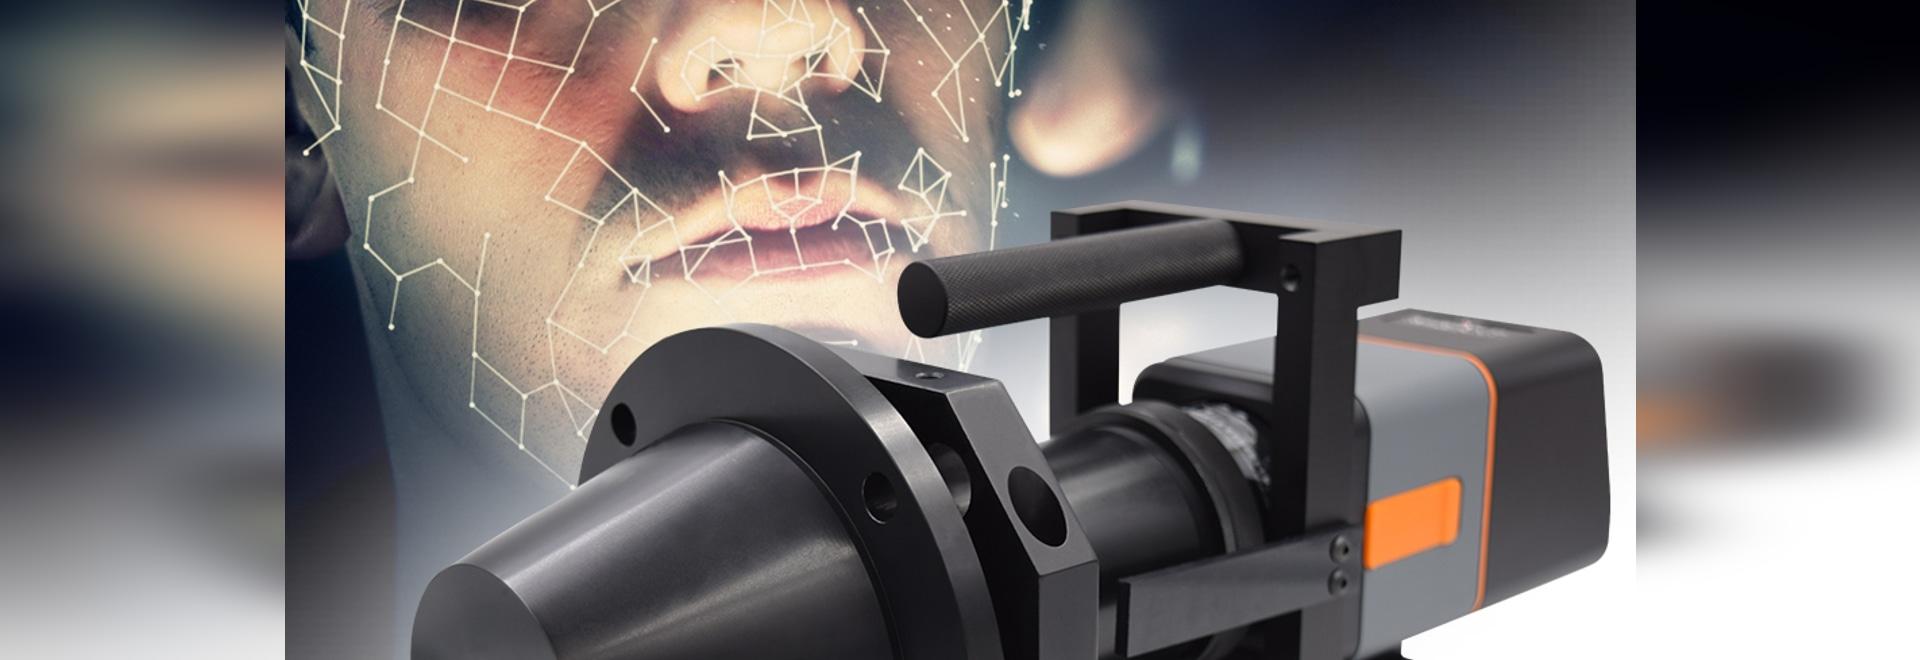 NIR Intensity Lens wins Silver-level Innovators Award from Vision Systems Design